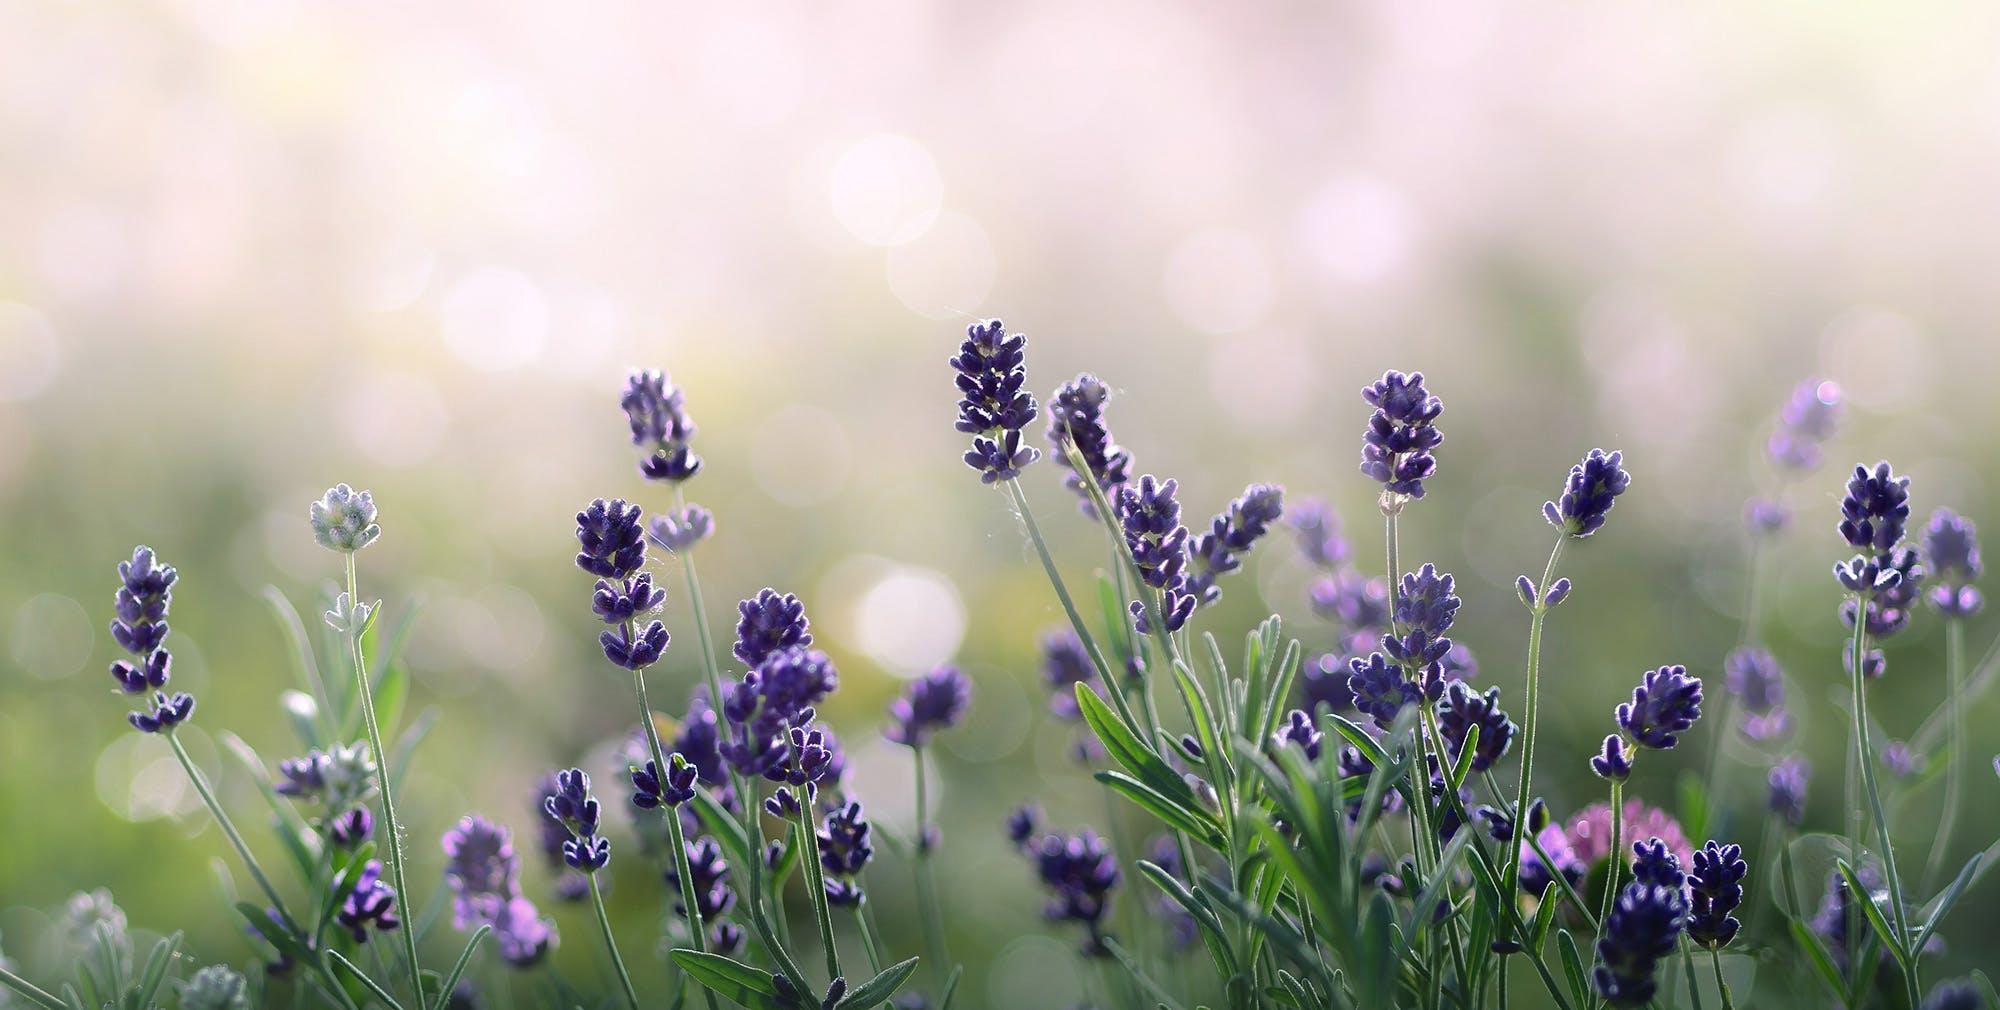 Lavender Picture - Taste Newberg - Newberg Oregon, Easy Portland Getaway